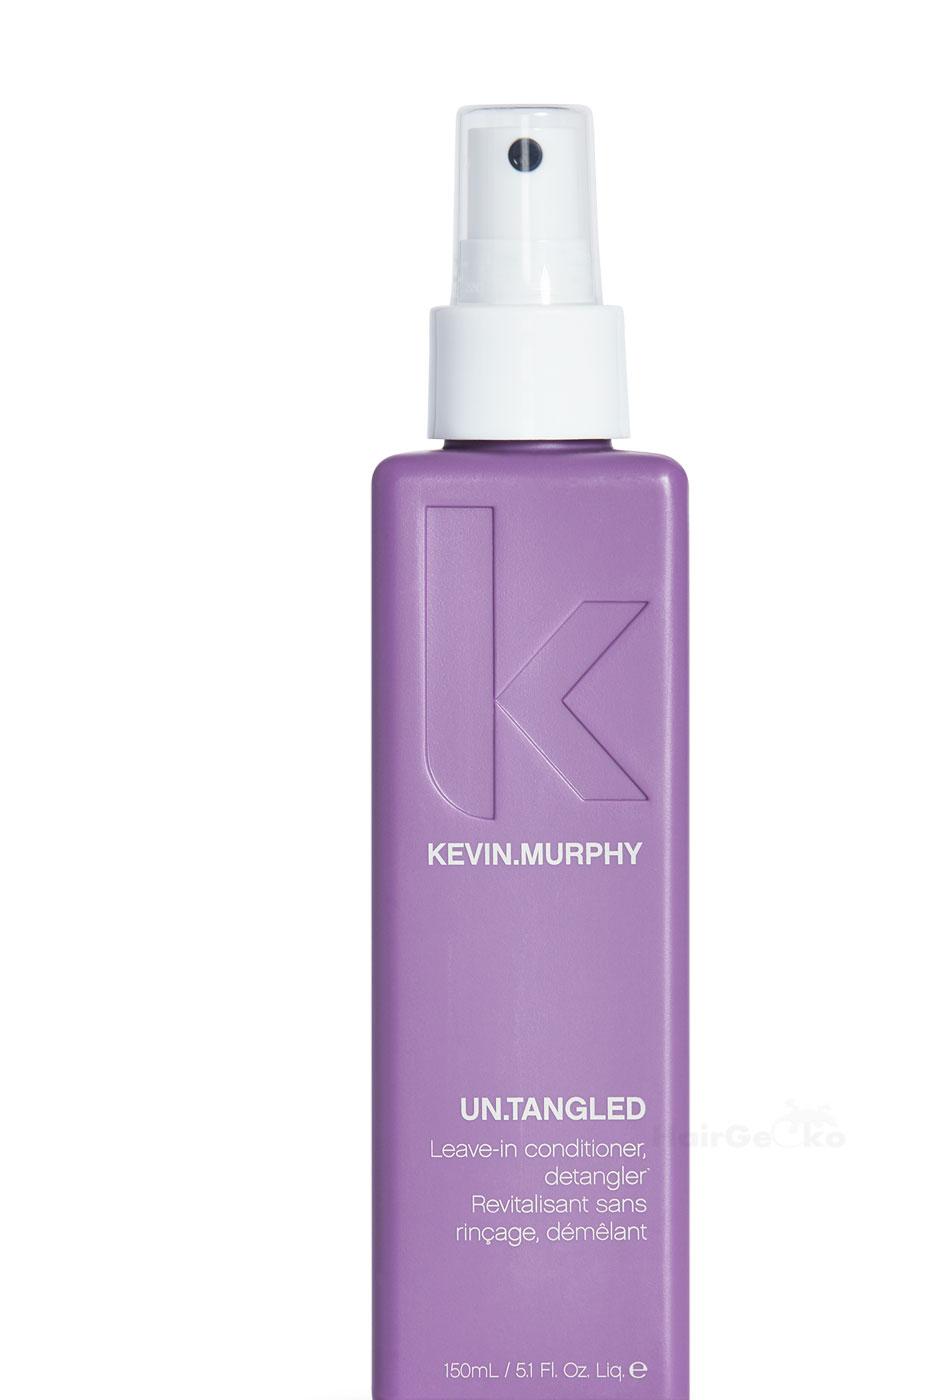 KEVIN.MURPHY UN.TANGLED 150 ml